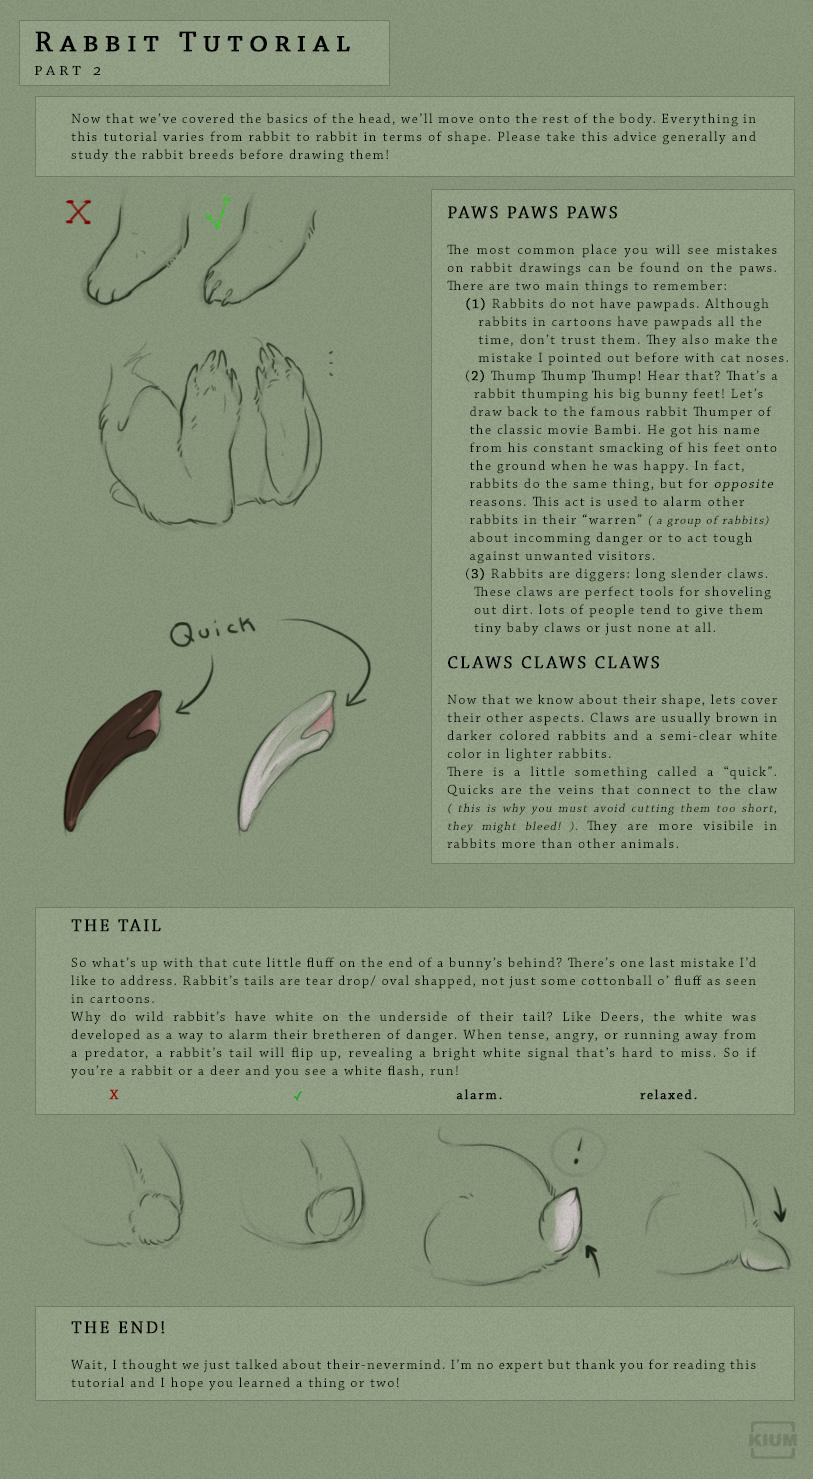 Rabbit tutorial part 2/2 by Kium